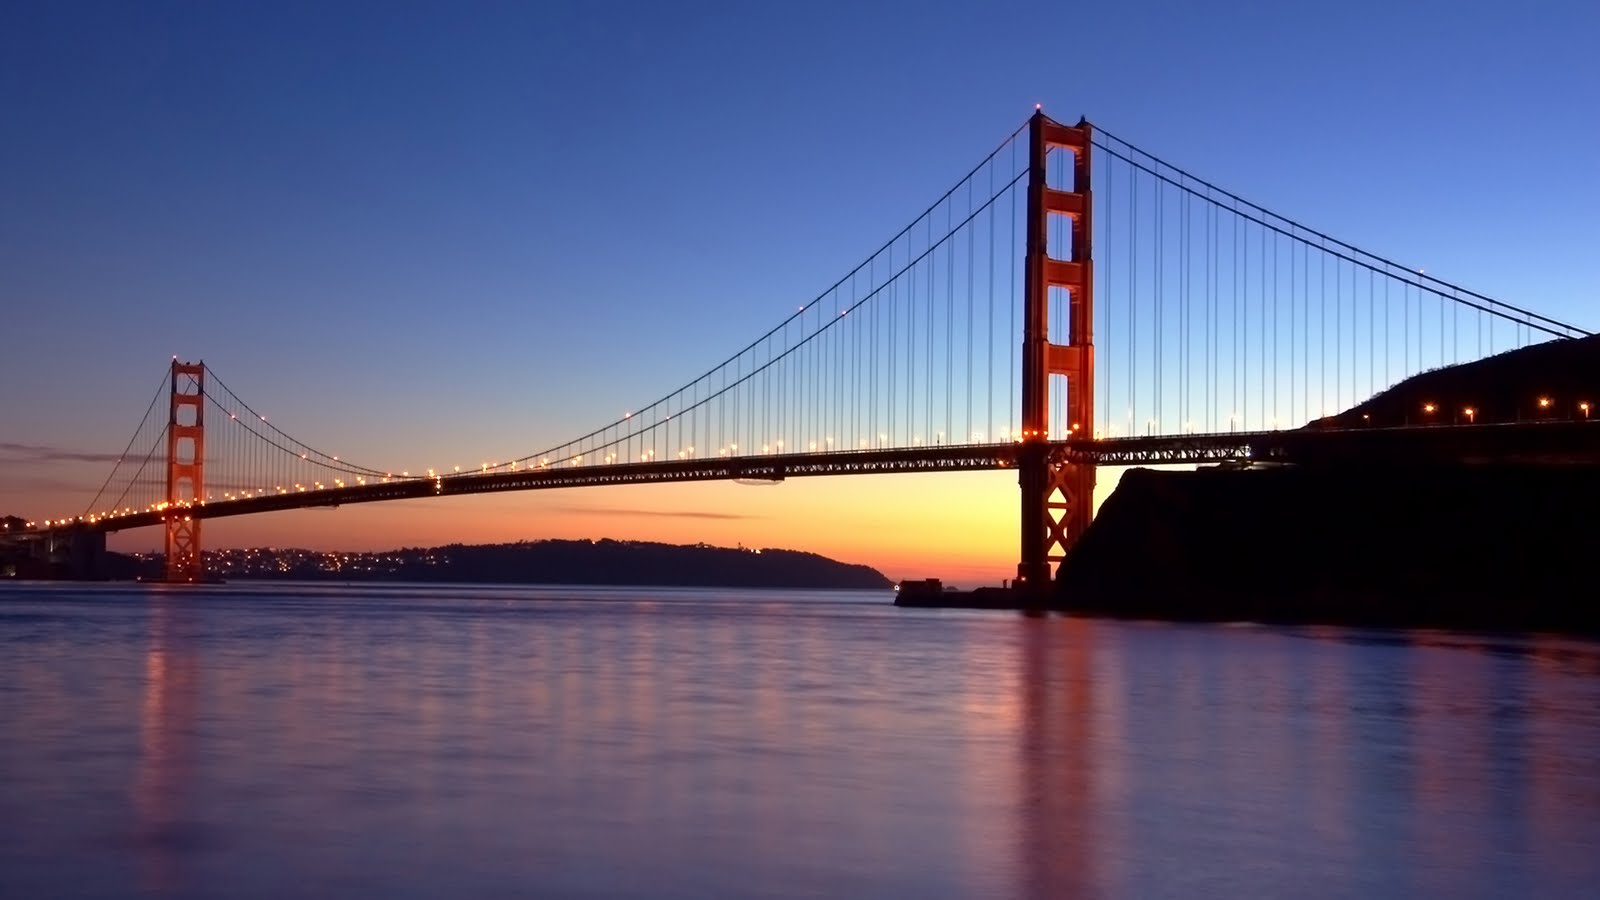 Introducing the golden bridge of san francisco